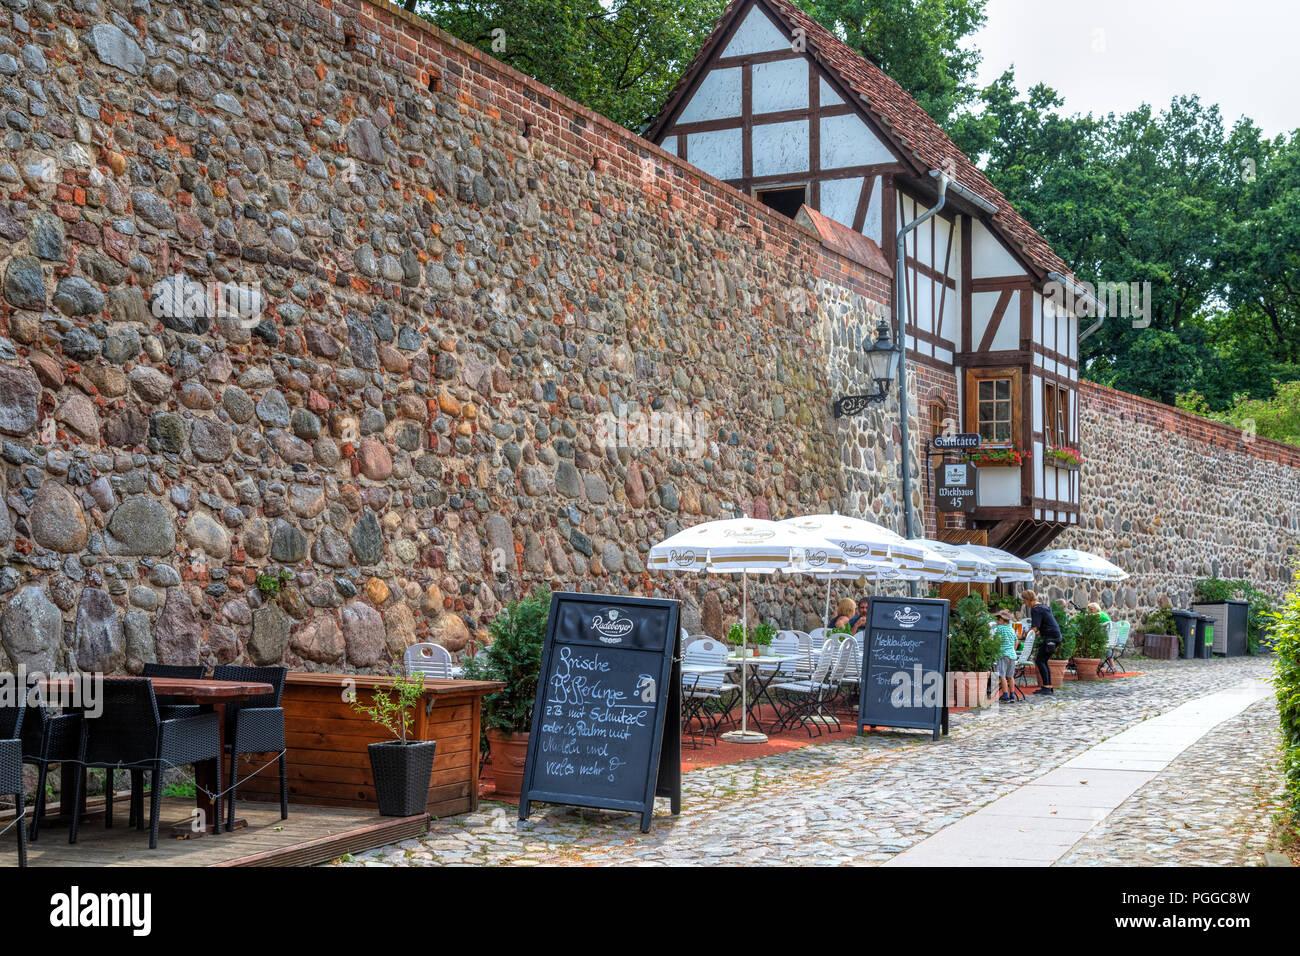 Neubrandenburg, old city, Mecklenburg-Vorpommern, Germany, Europe - Stock Image